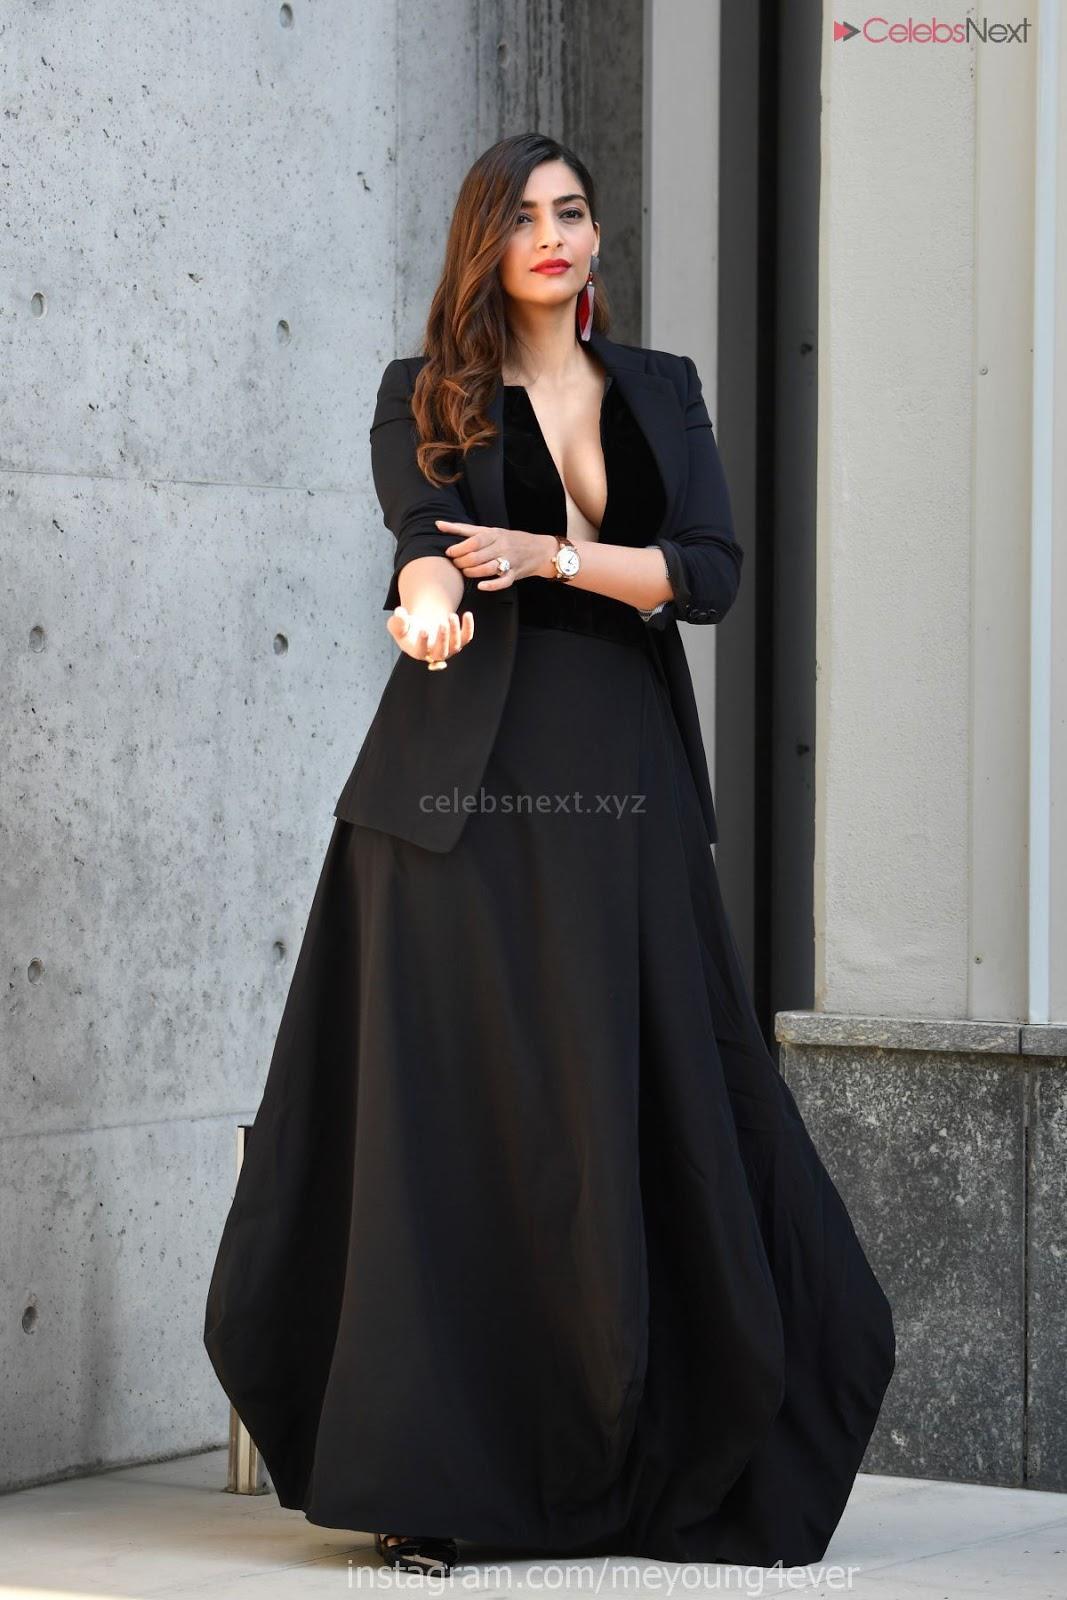 Sonam Kapoor looks ravishing in Black deep neck gown with her husband